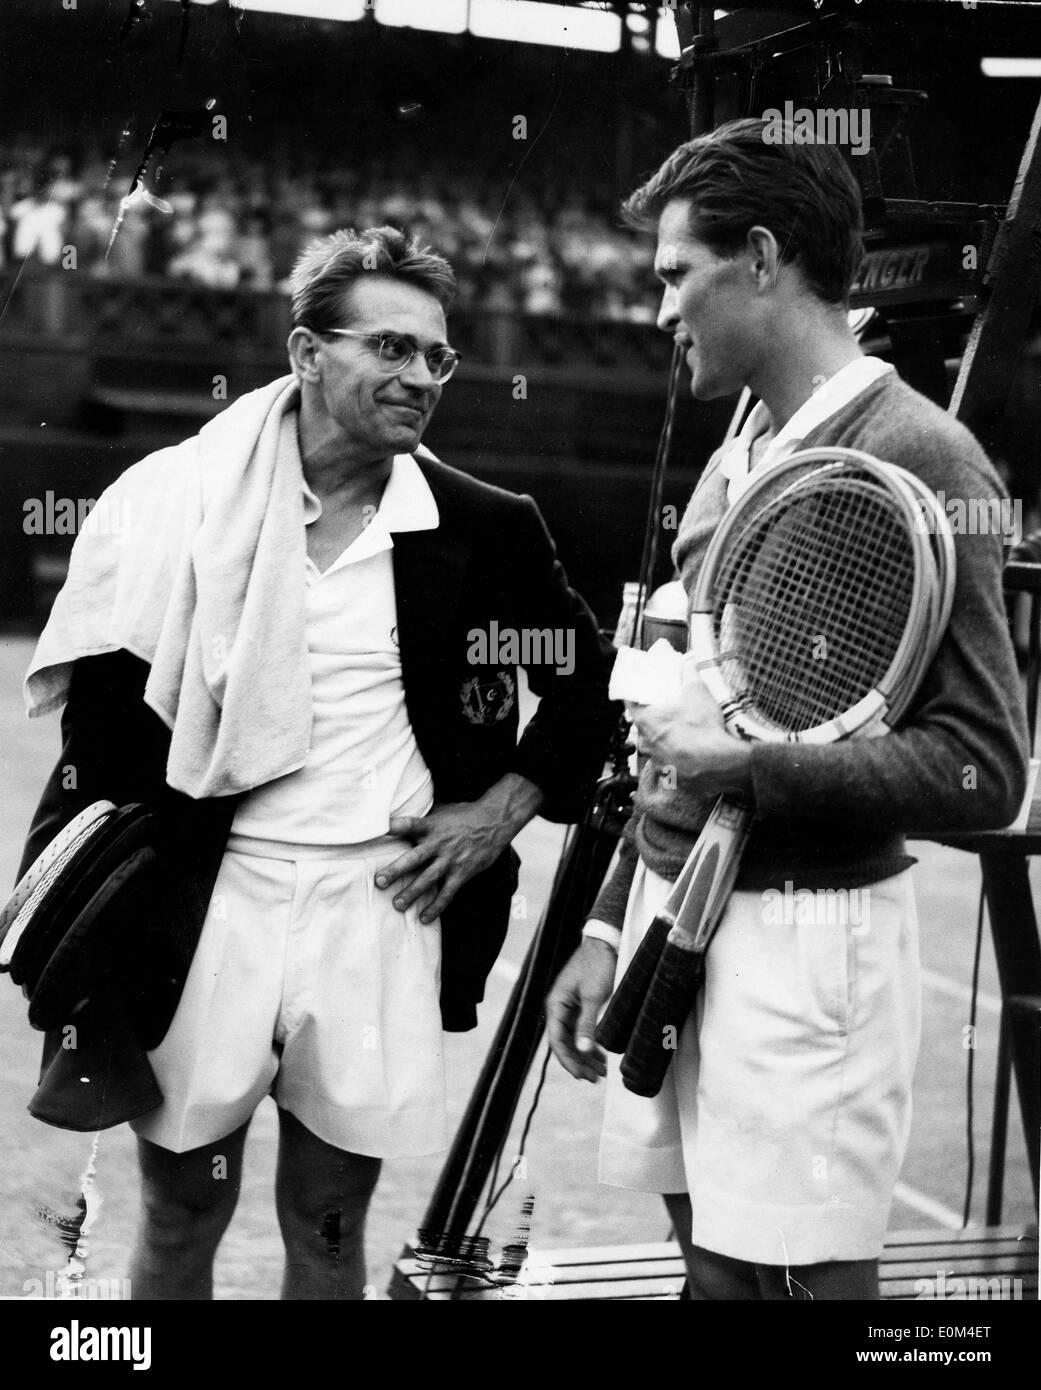 Tennis Stars Jaroslav Drobny and Budge Patty talking at Wimbledon